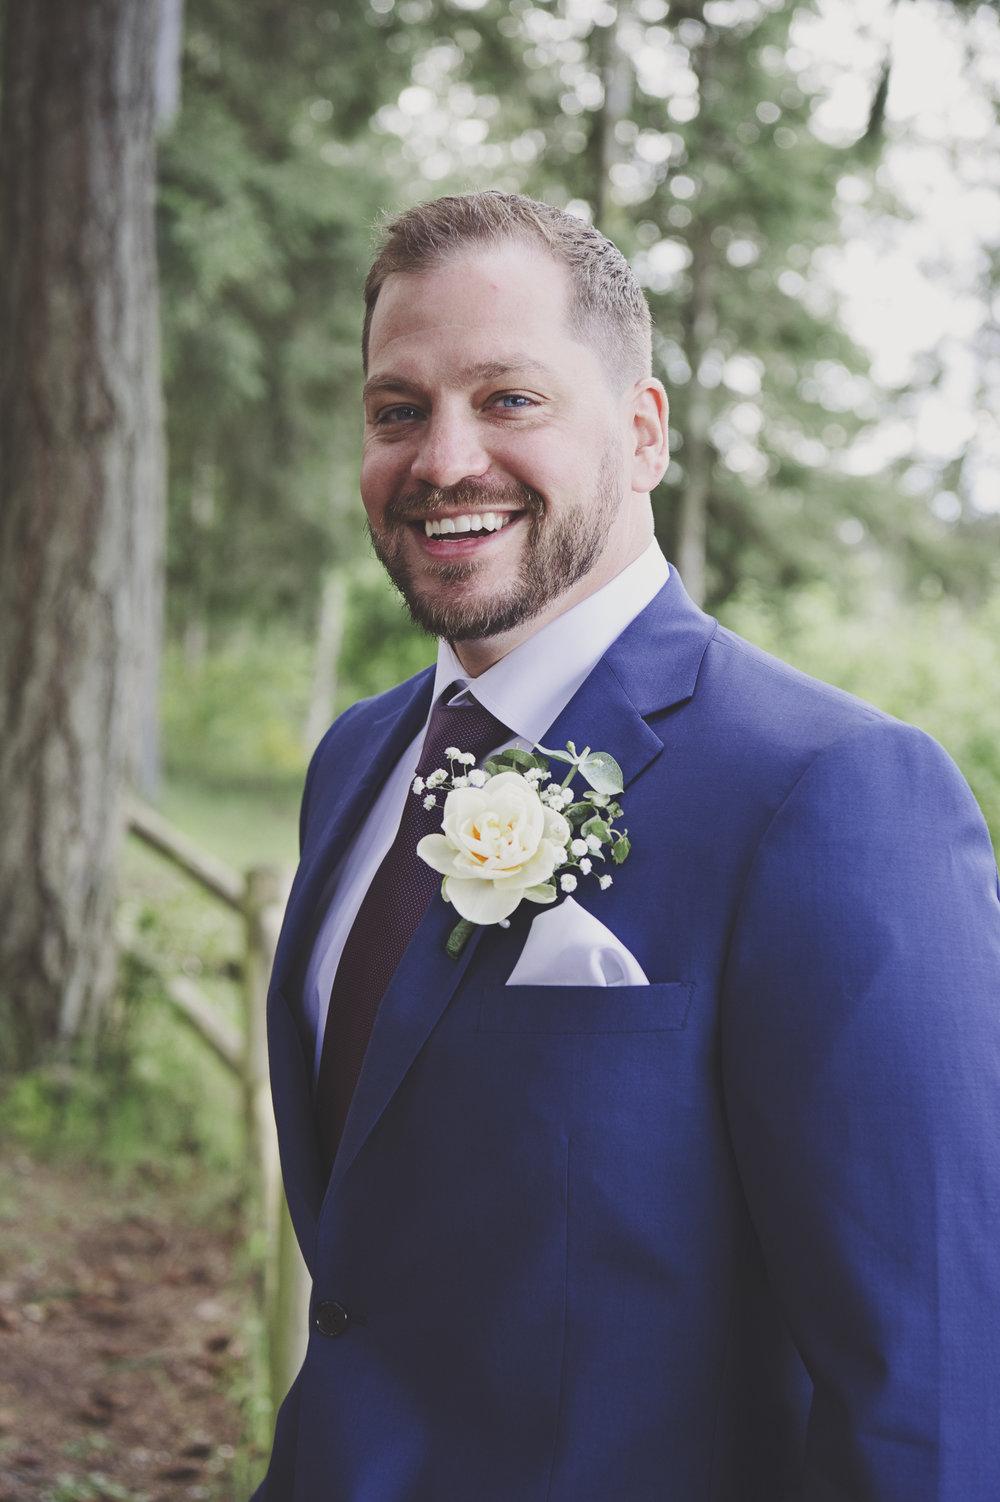 Pacific Northwest Wedding | Forest Wedding | Kitsap Memorial Park Wedding | Kelsey Lane Photography